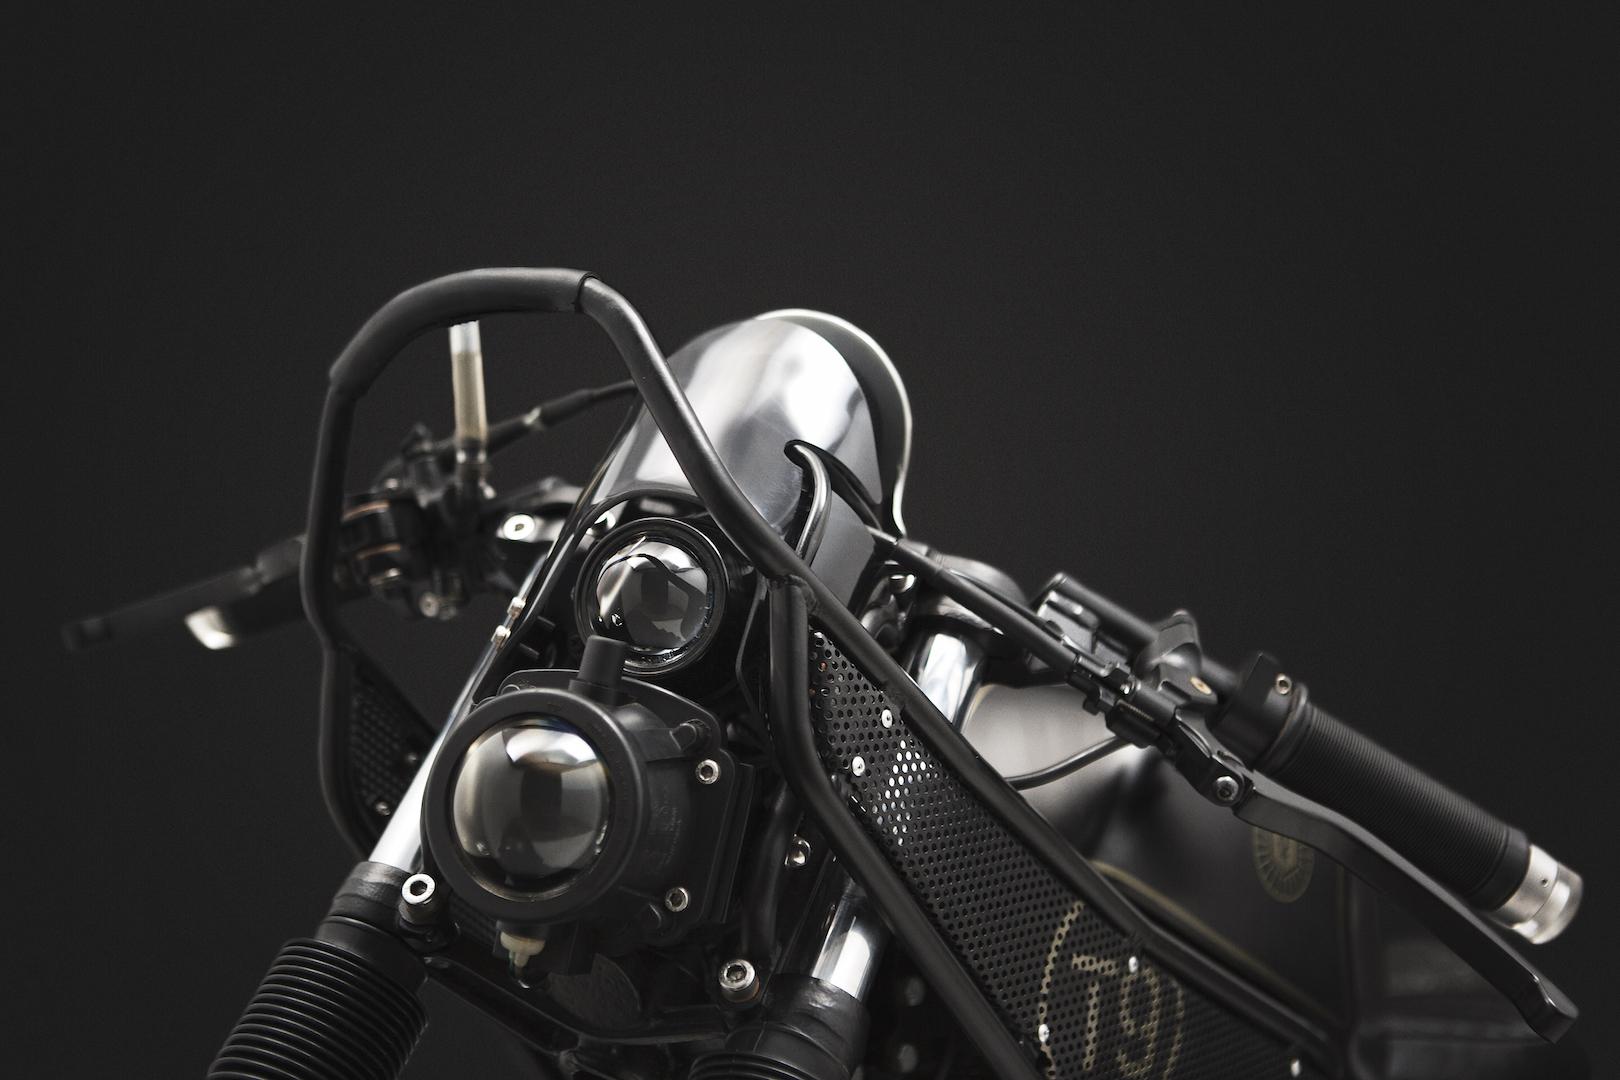 Thrive_Motorcycles_T009_Honda_CB250_Custom_Moto-Mucci (5).jpg